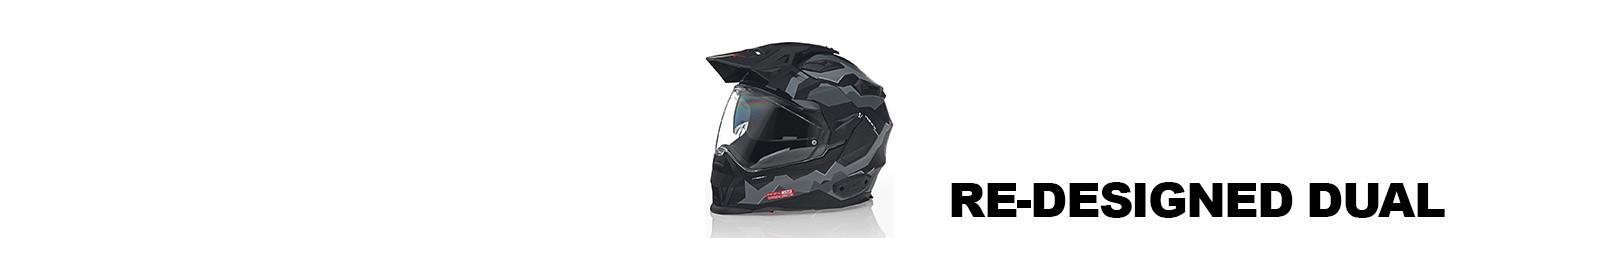 Nexx XWED Helmets